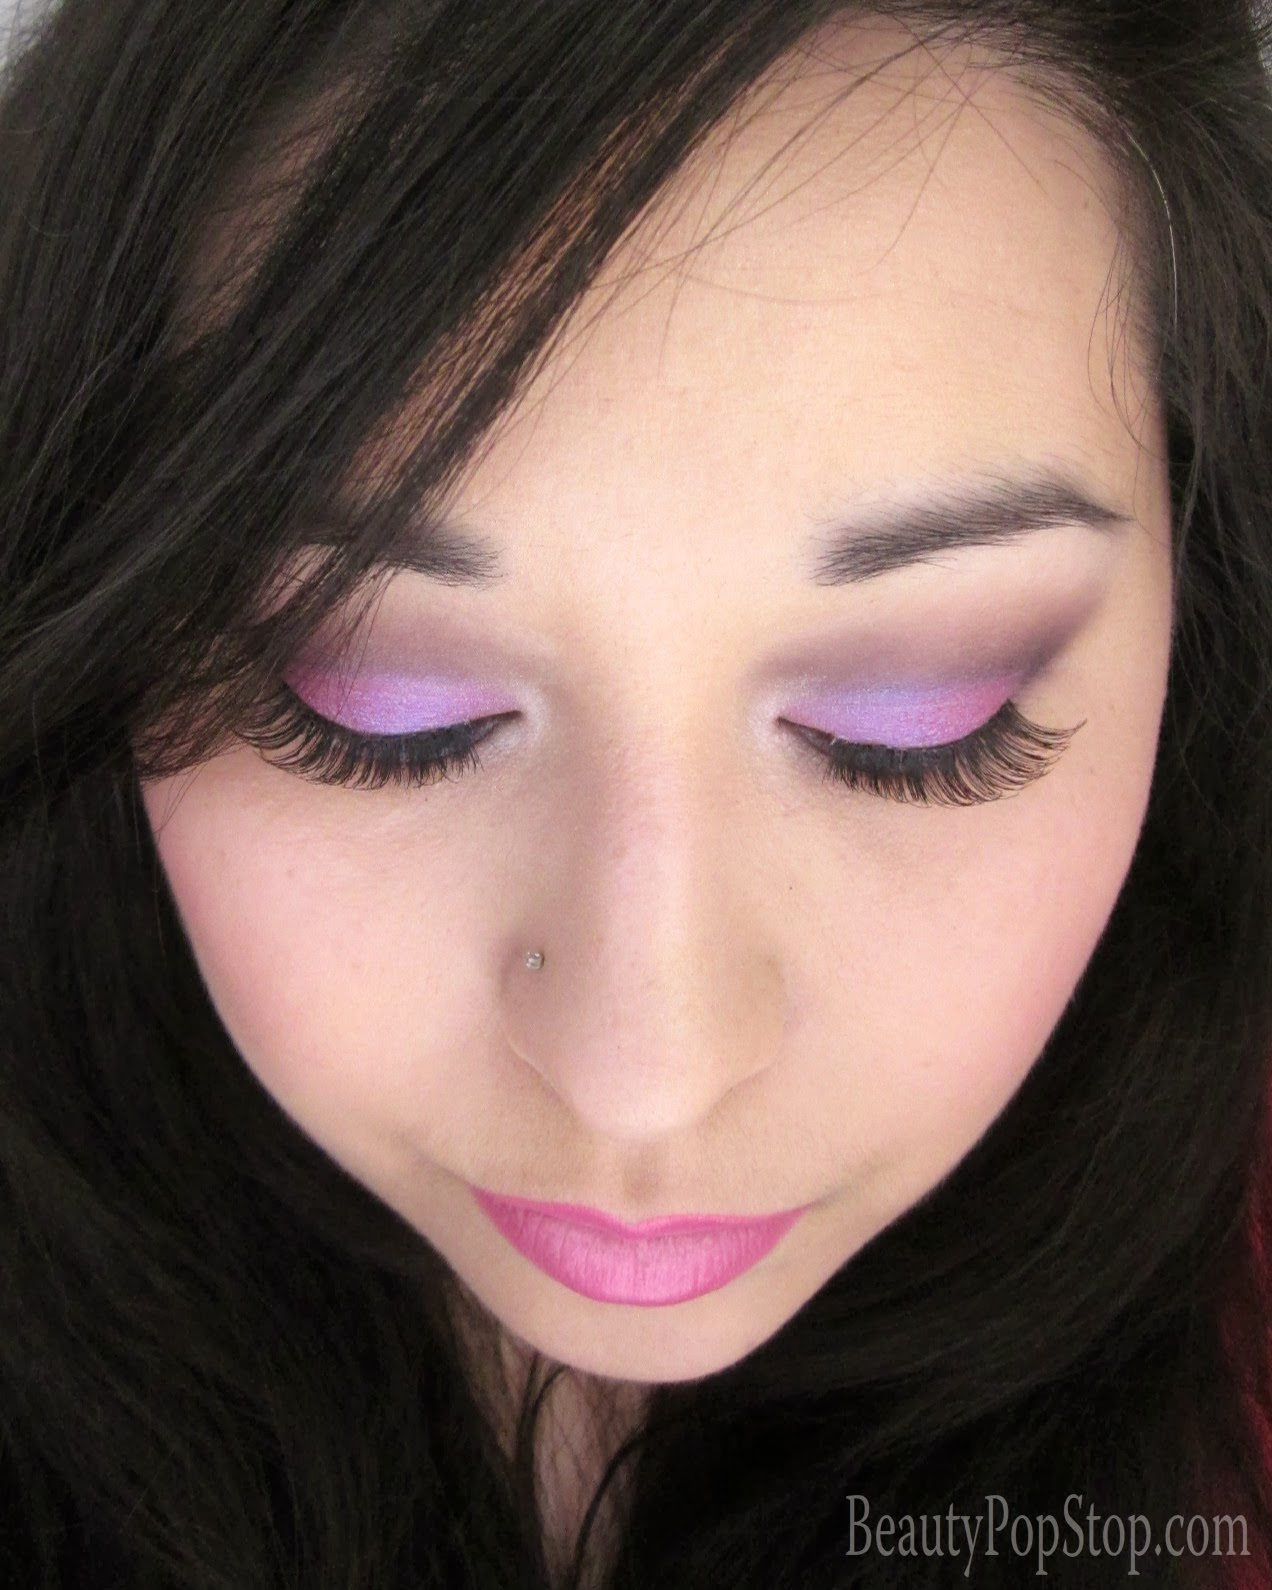 paul and joe beaute spring 2014 makeup tutorial using sugarpill, mac, make up for ever, inglot